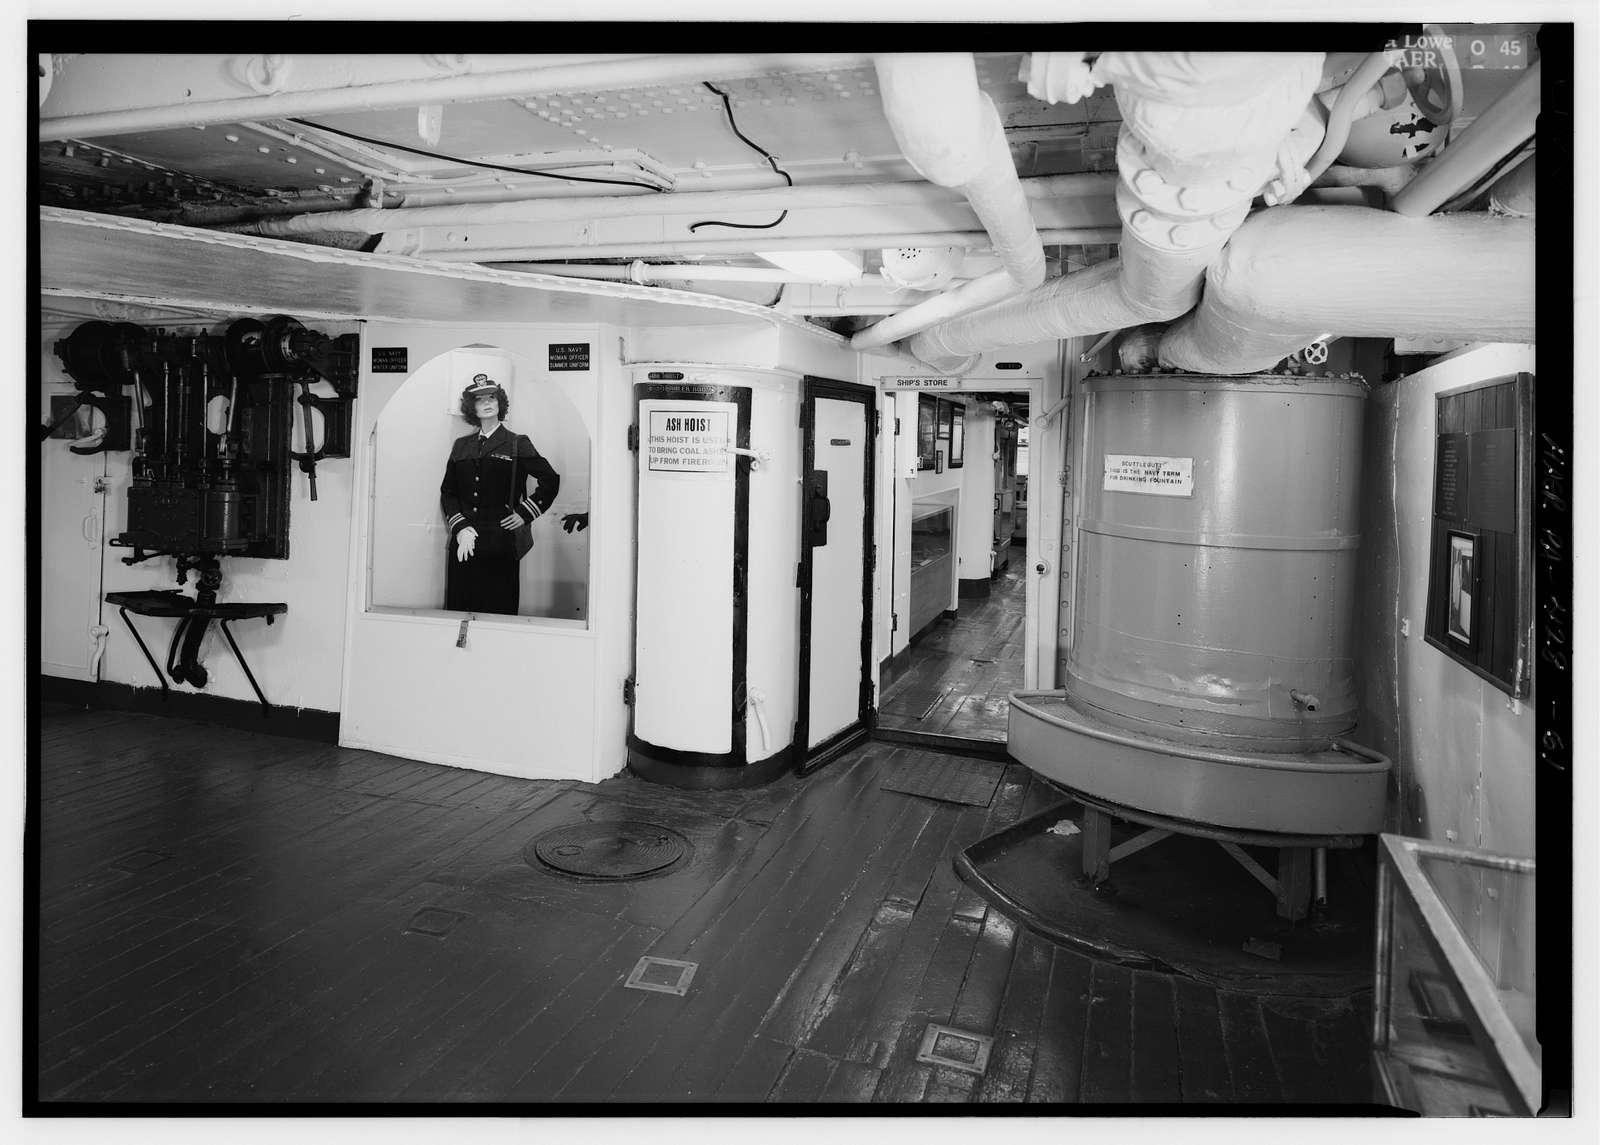 USS Olympia, Penn's Landing, 211 South Columbus Boulevard, Philadelphia, Philadelphia County, PA